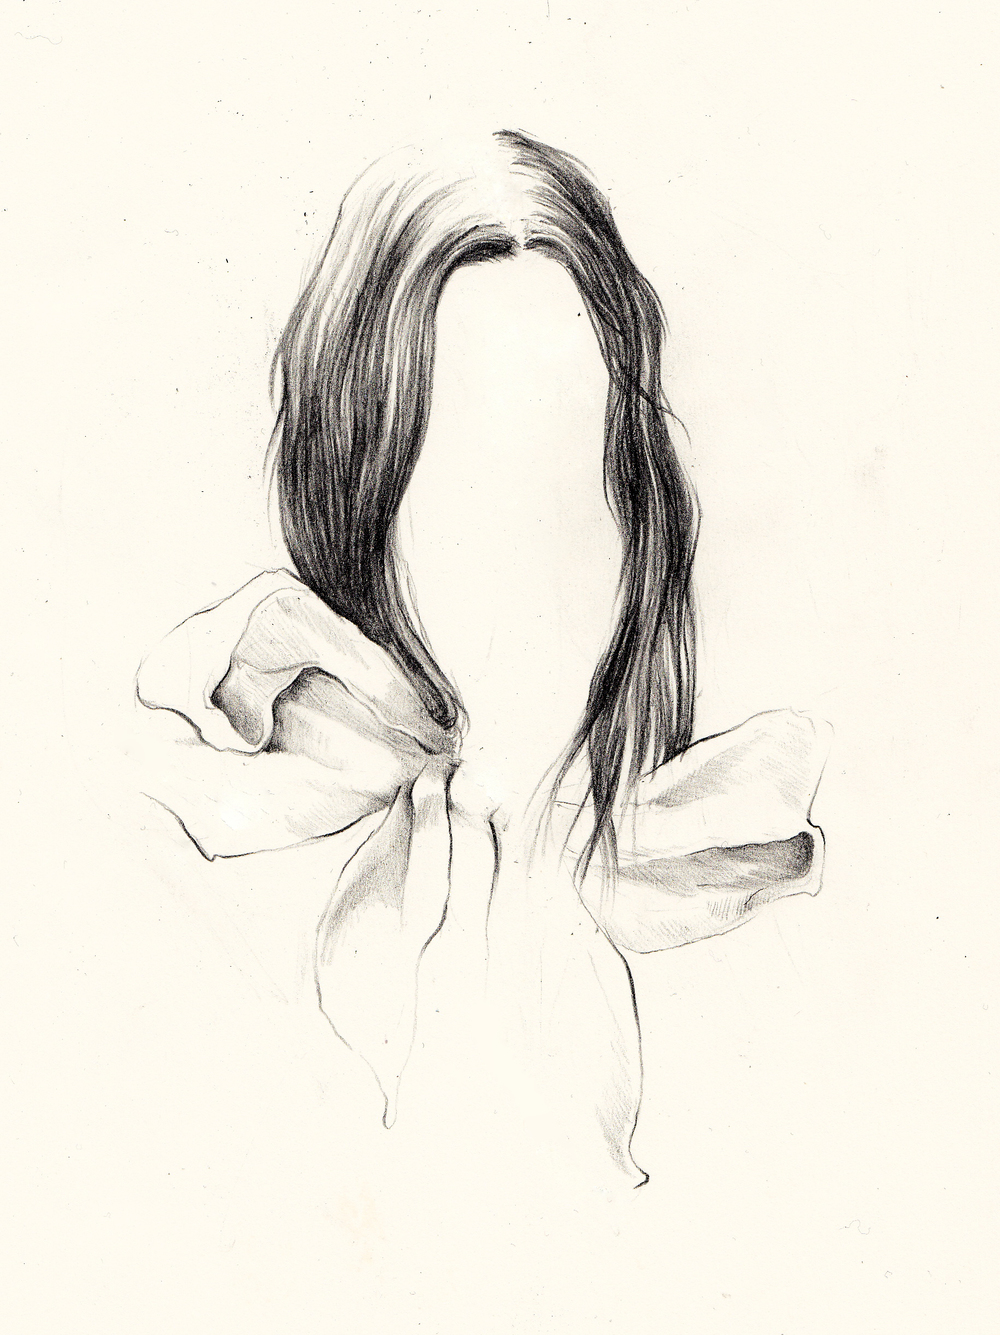 Graphite on paper, 2010.